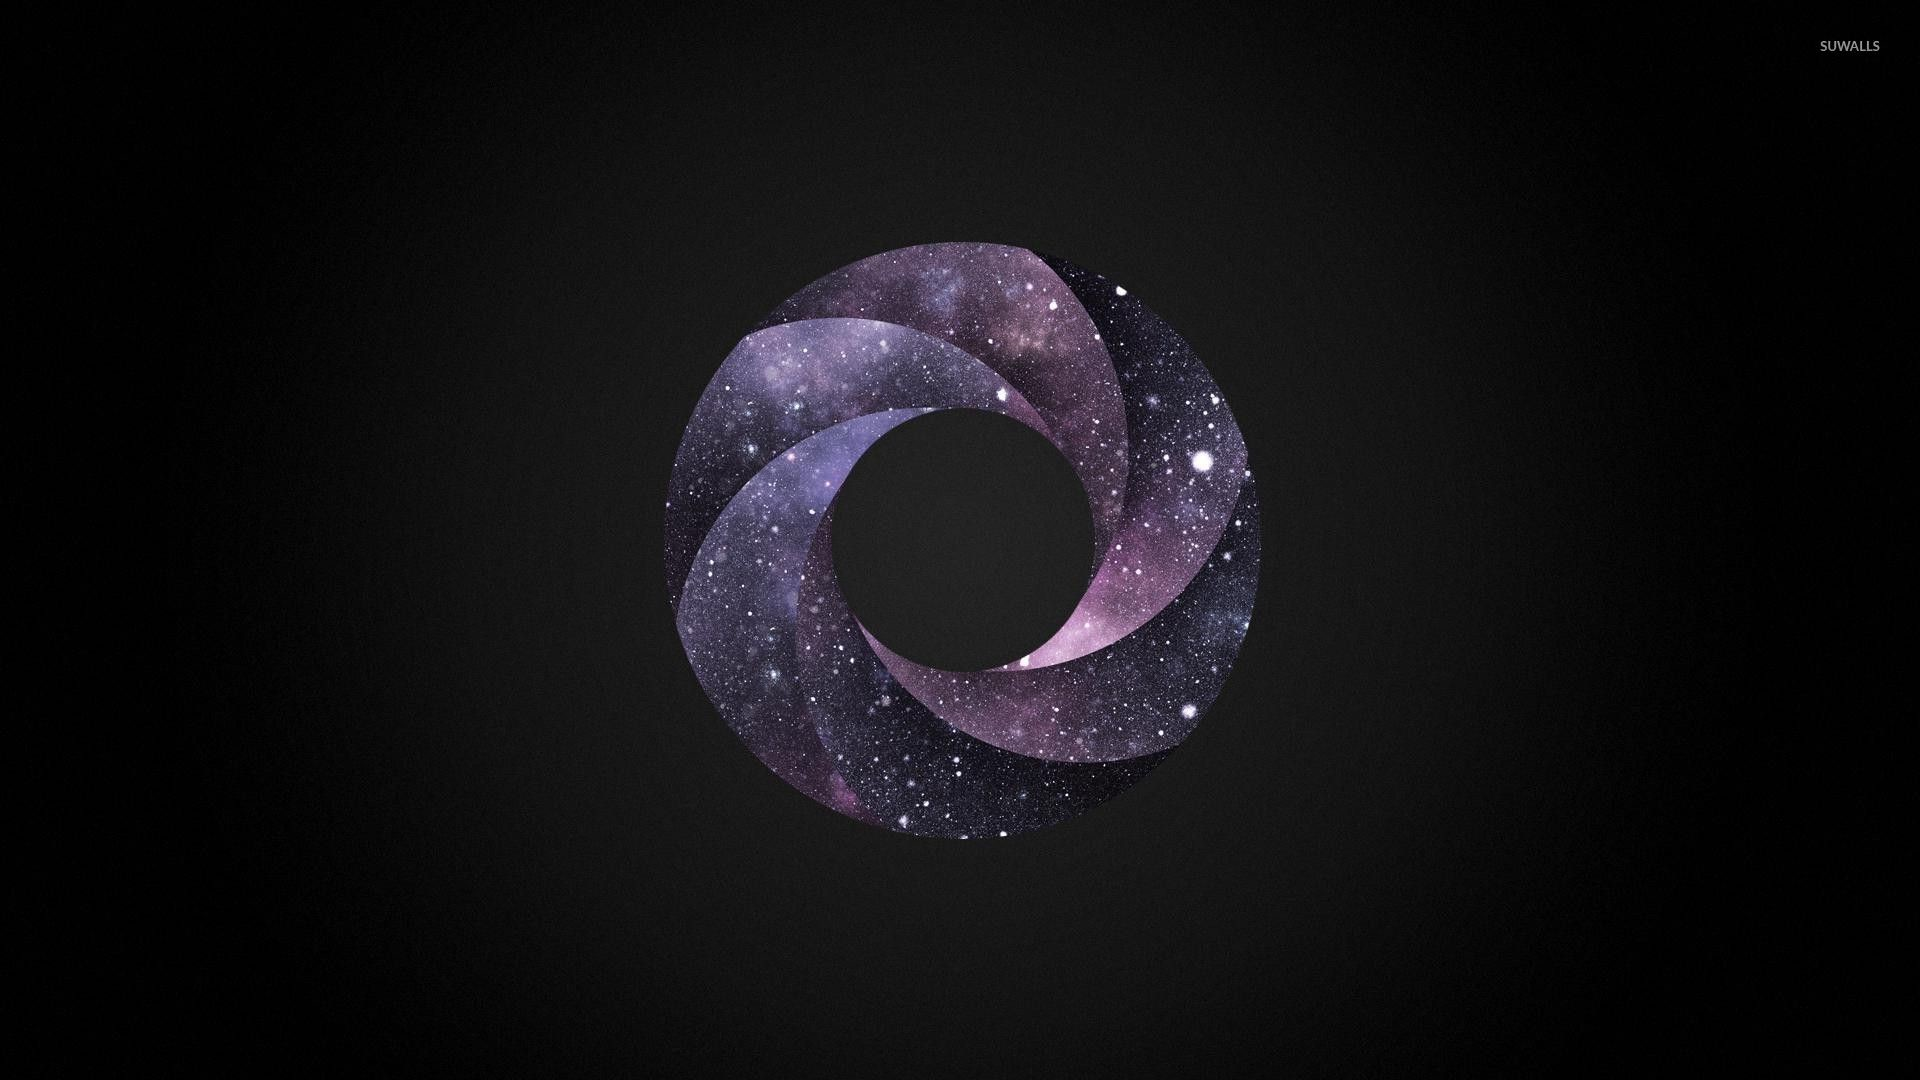 Cosmic swirl on the dark background wallpaper jpg